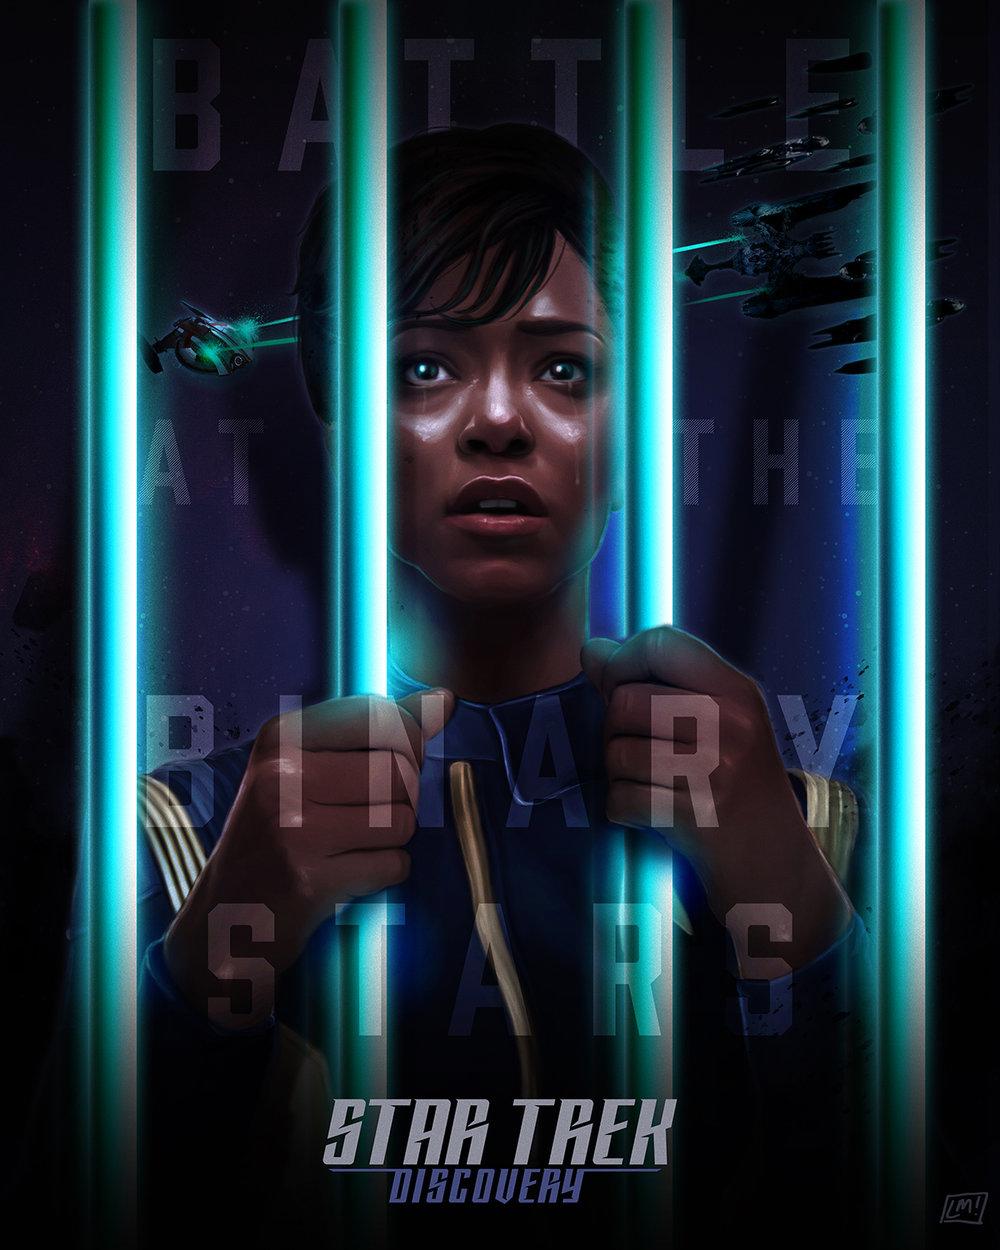 Star Trek Discovery Season 1 Episode 2 Battle At The Binary Stars